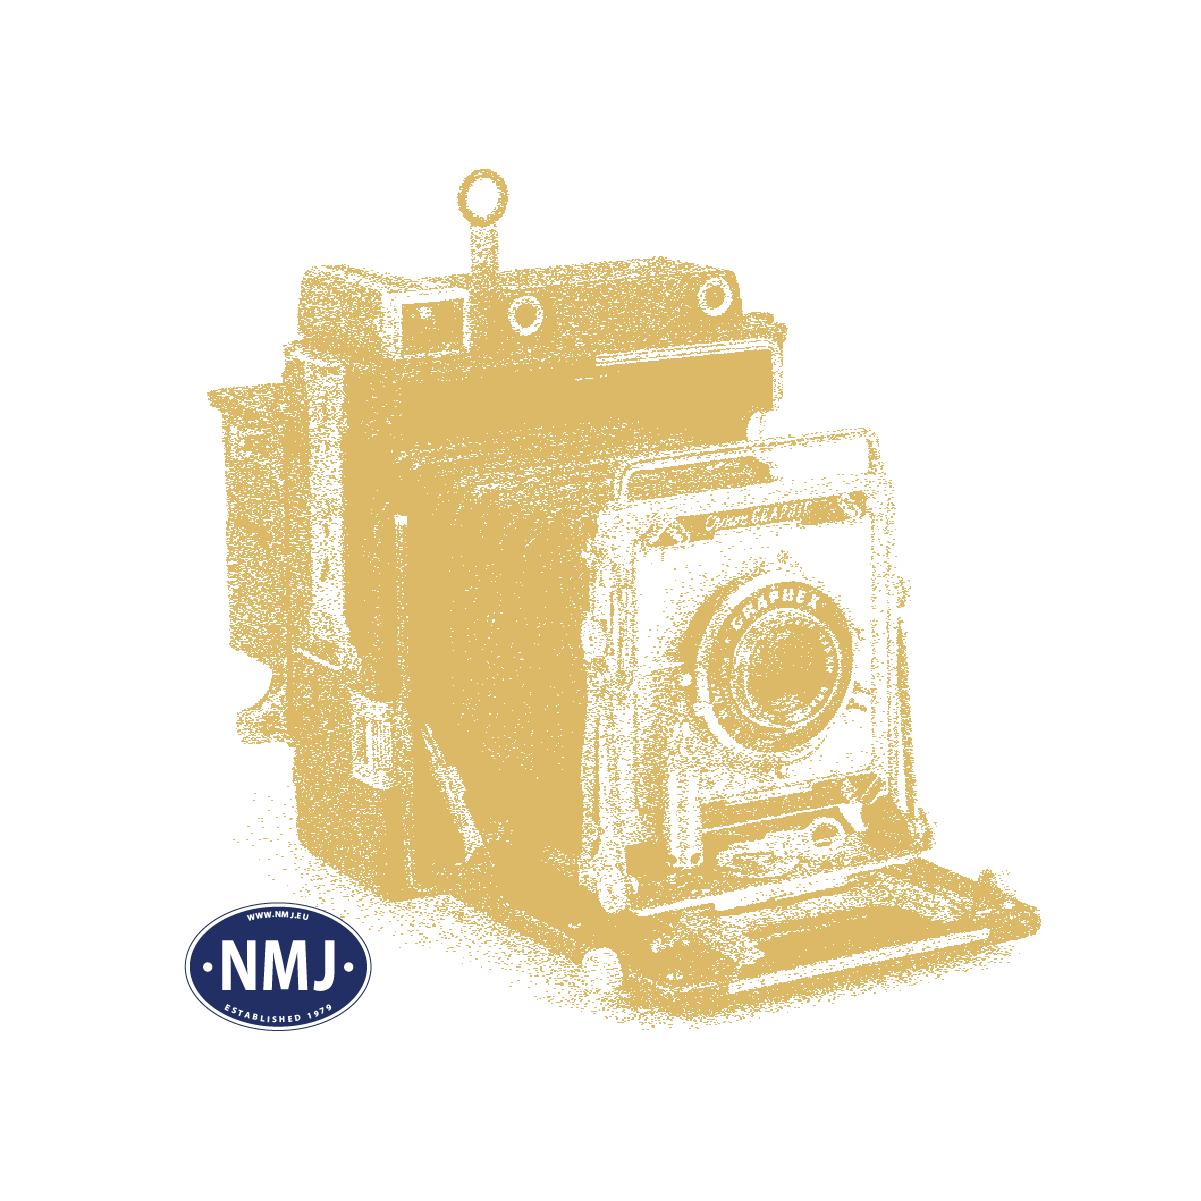 NMJT84.203AC - NMJ Topline Modell NSB BM69A.06 rot/schwarz, AC digital